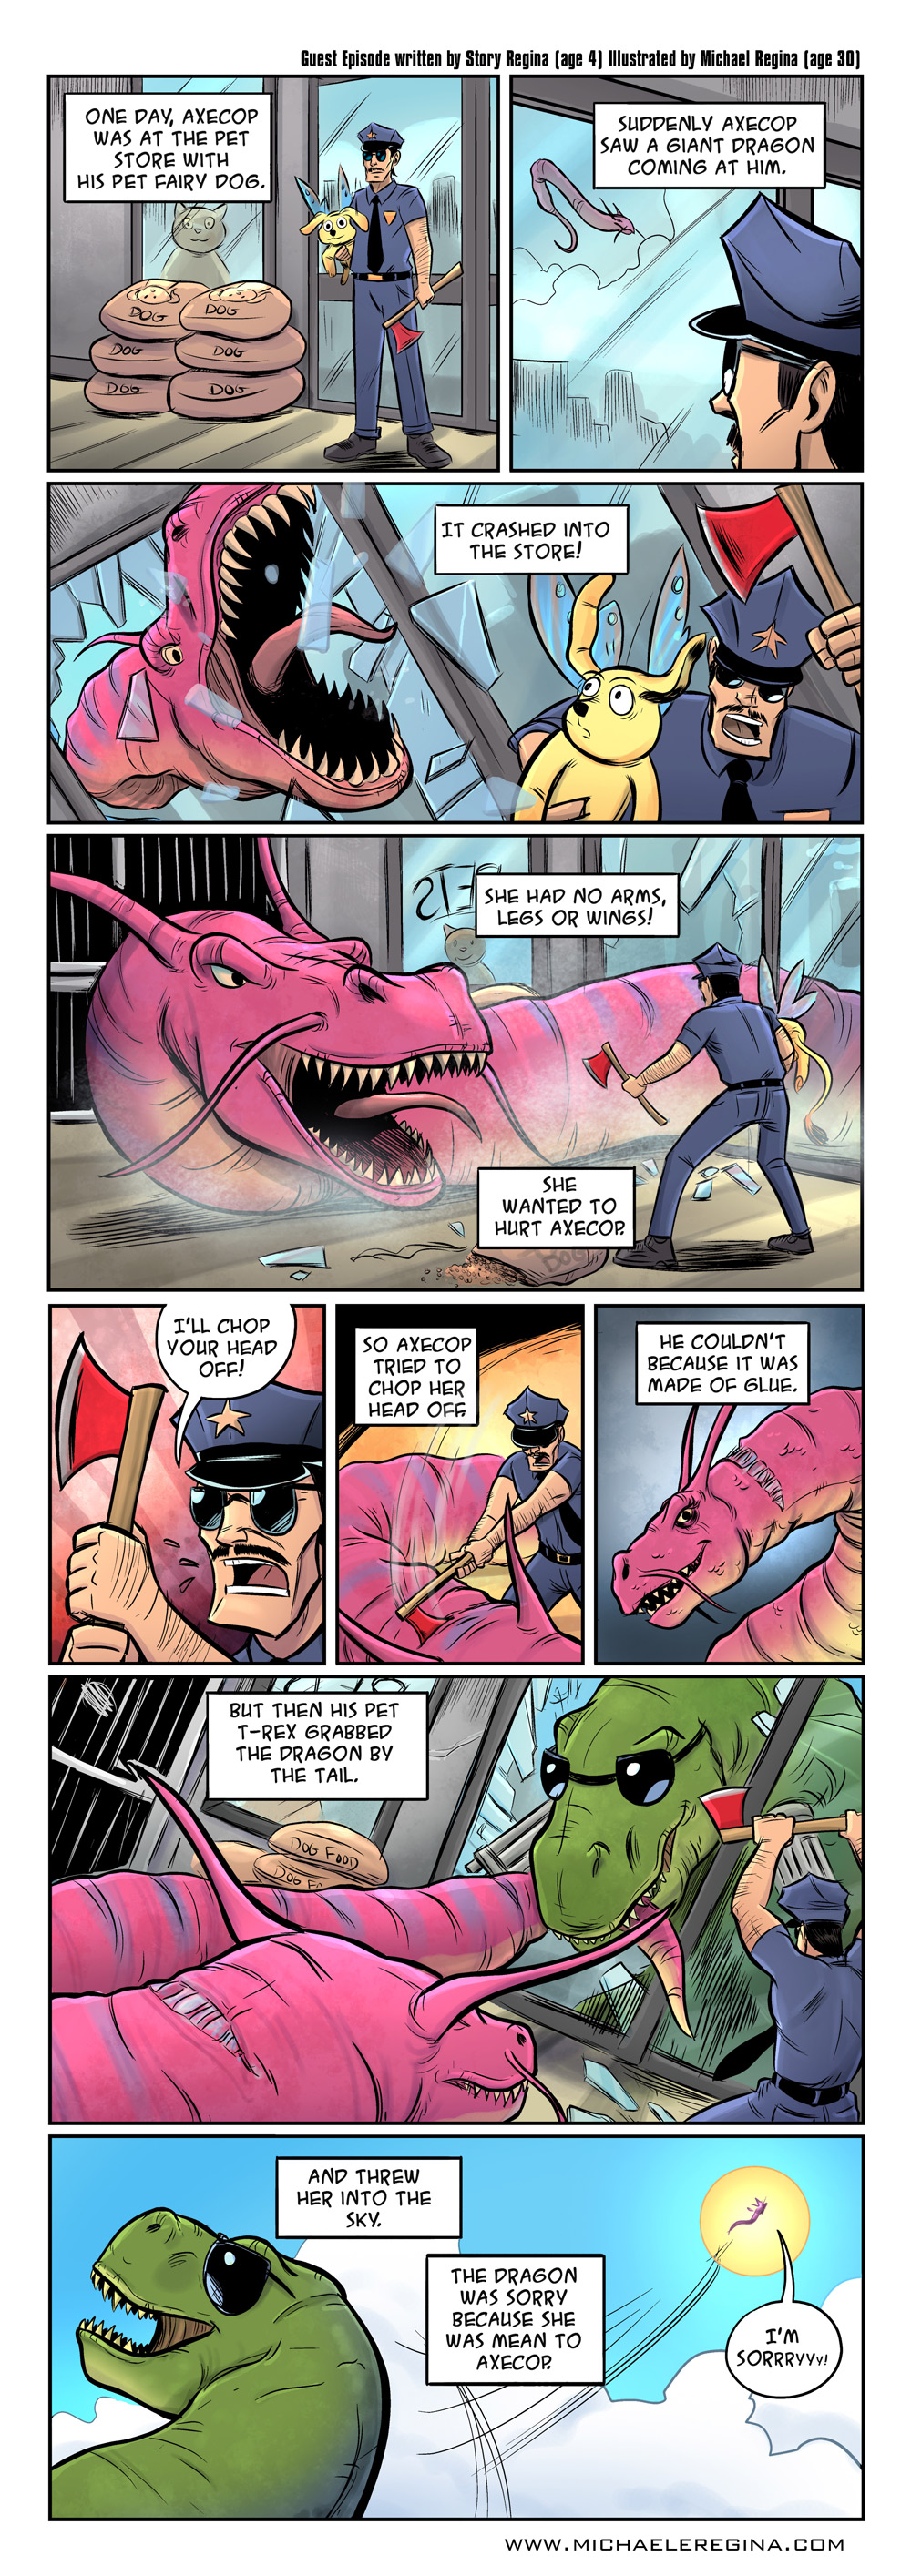 Axe Cop Guest Episode #39